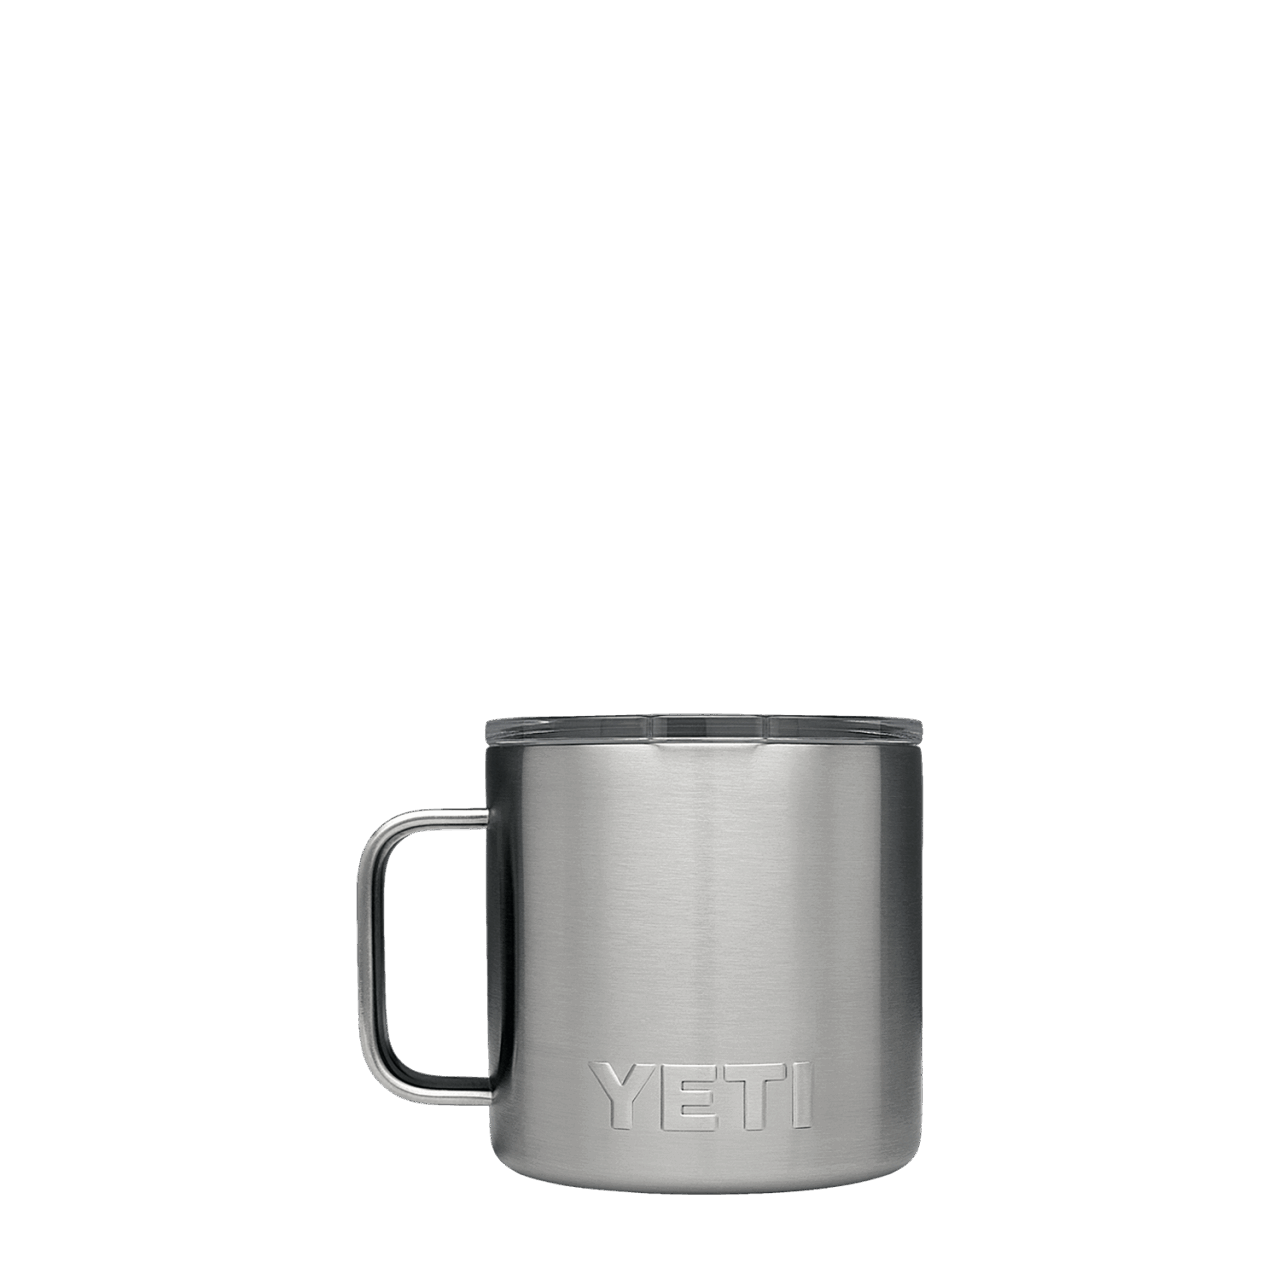 YETI Rambler Tasse - steel